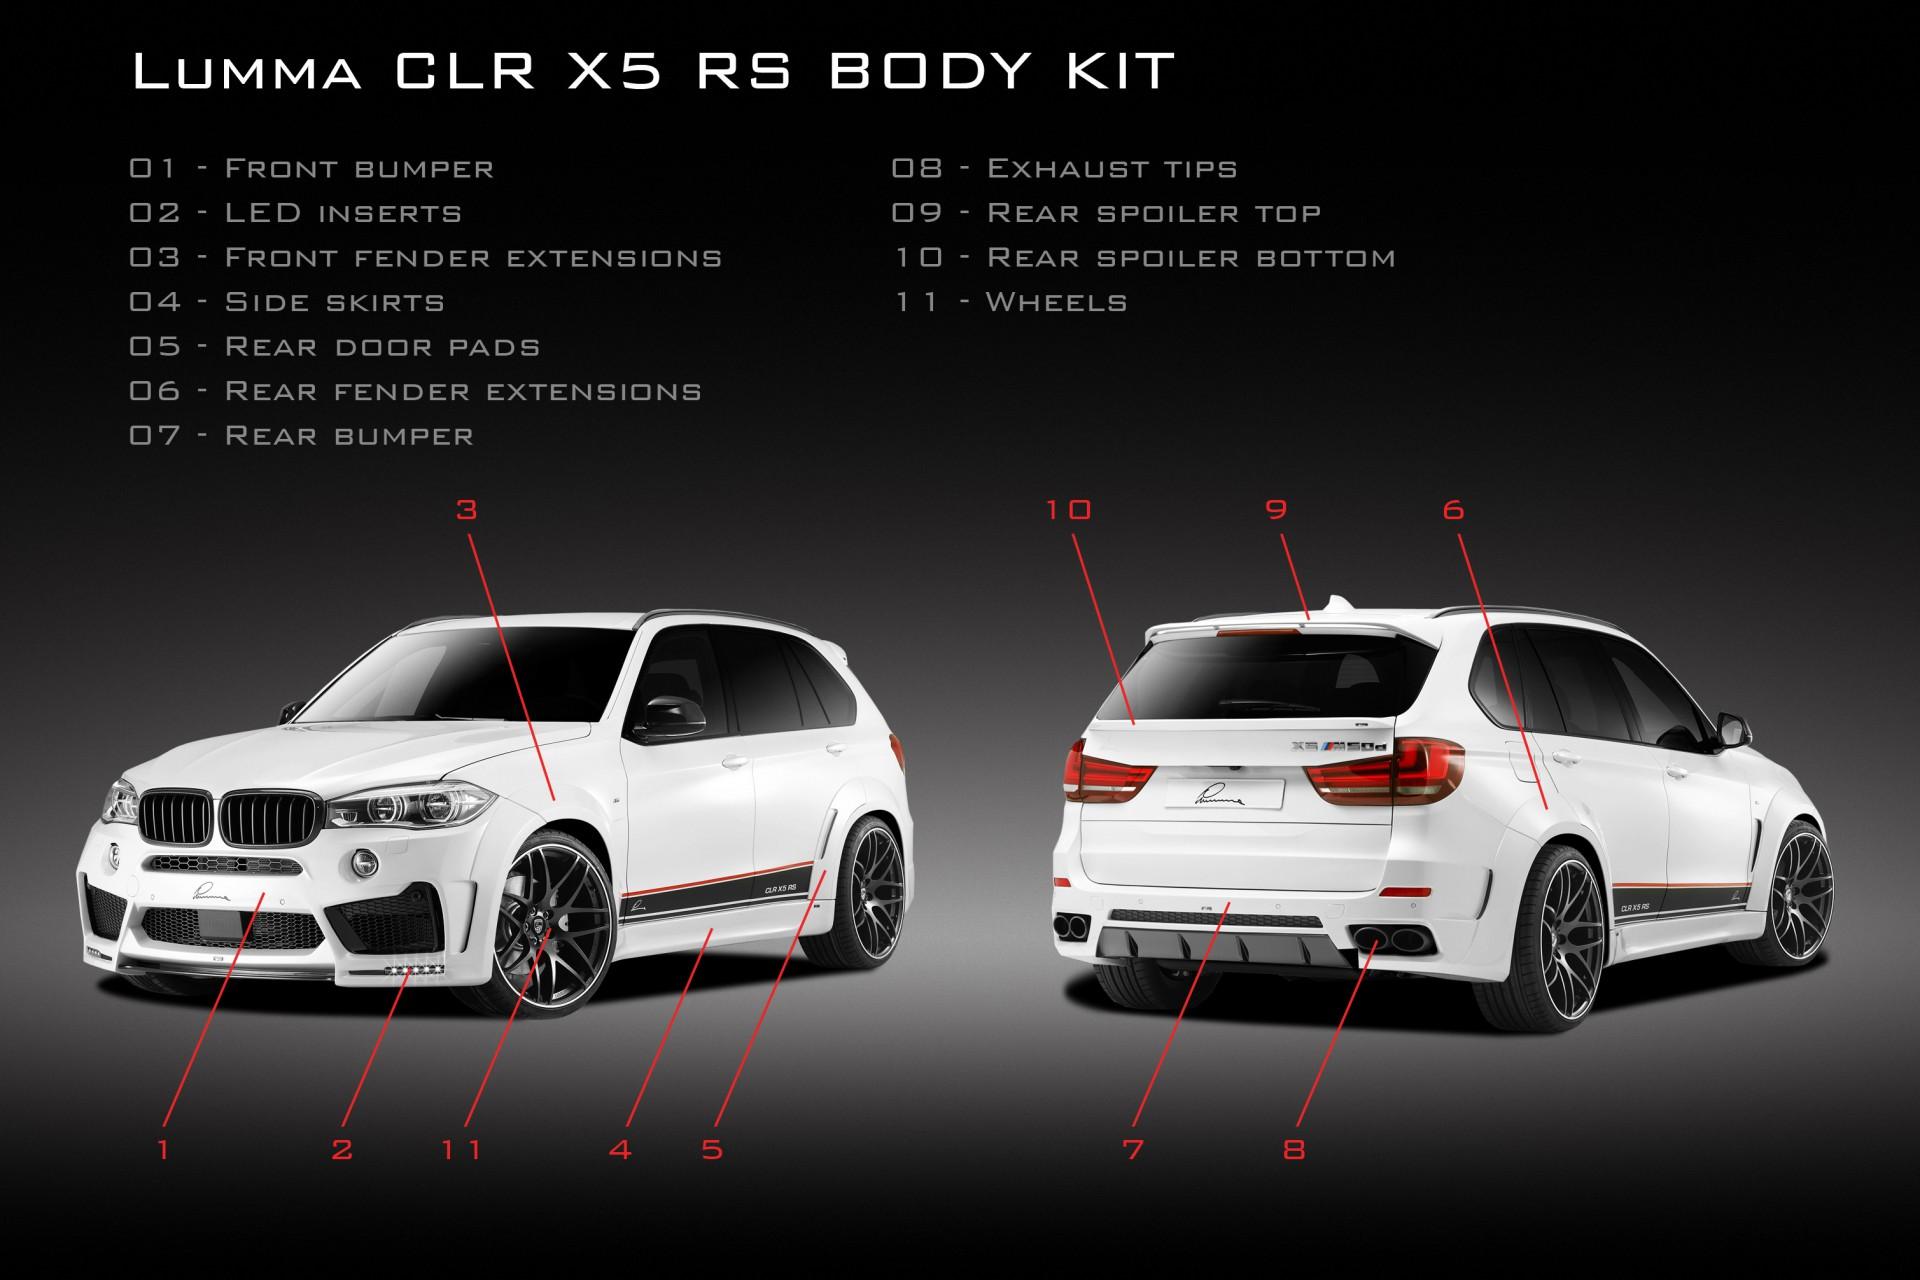 Red X5 Bmw >> Tuning BMW X5 (F15) - Lumma CLR X 5 RS / TopCar